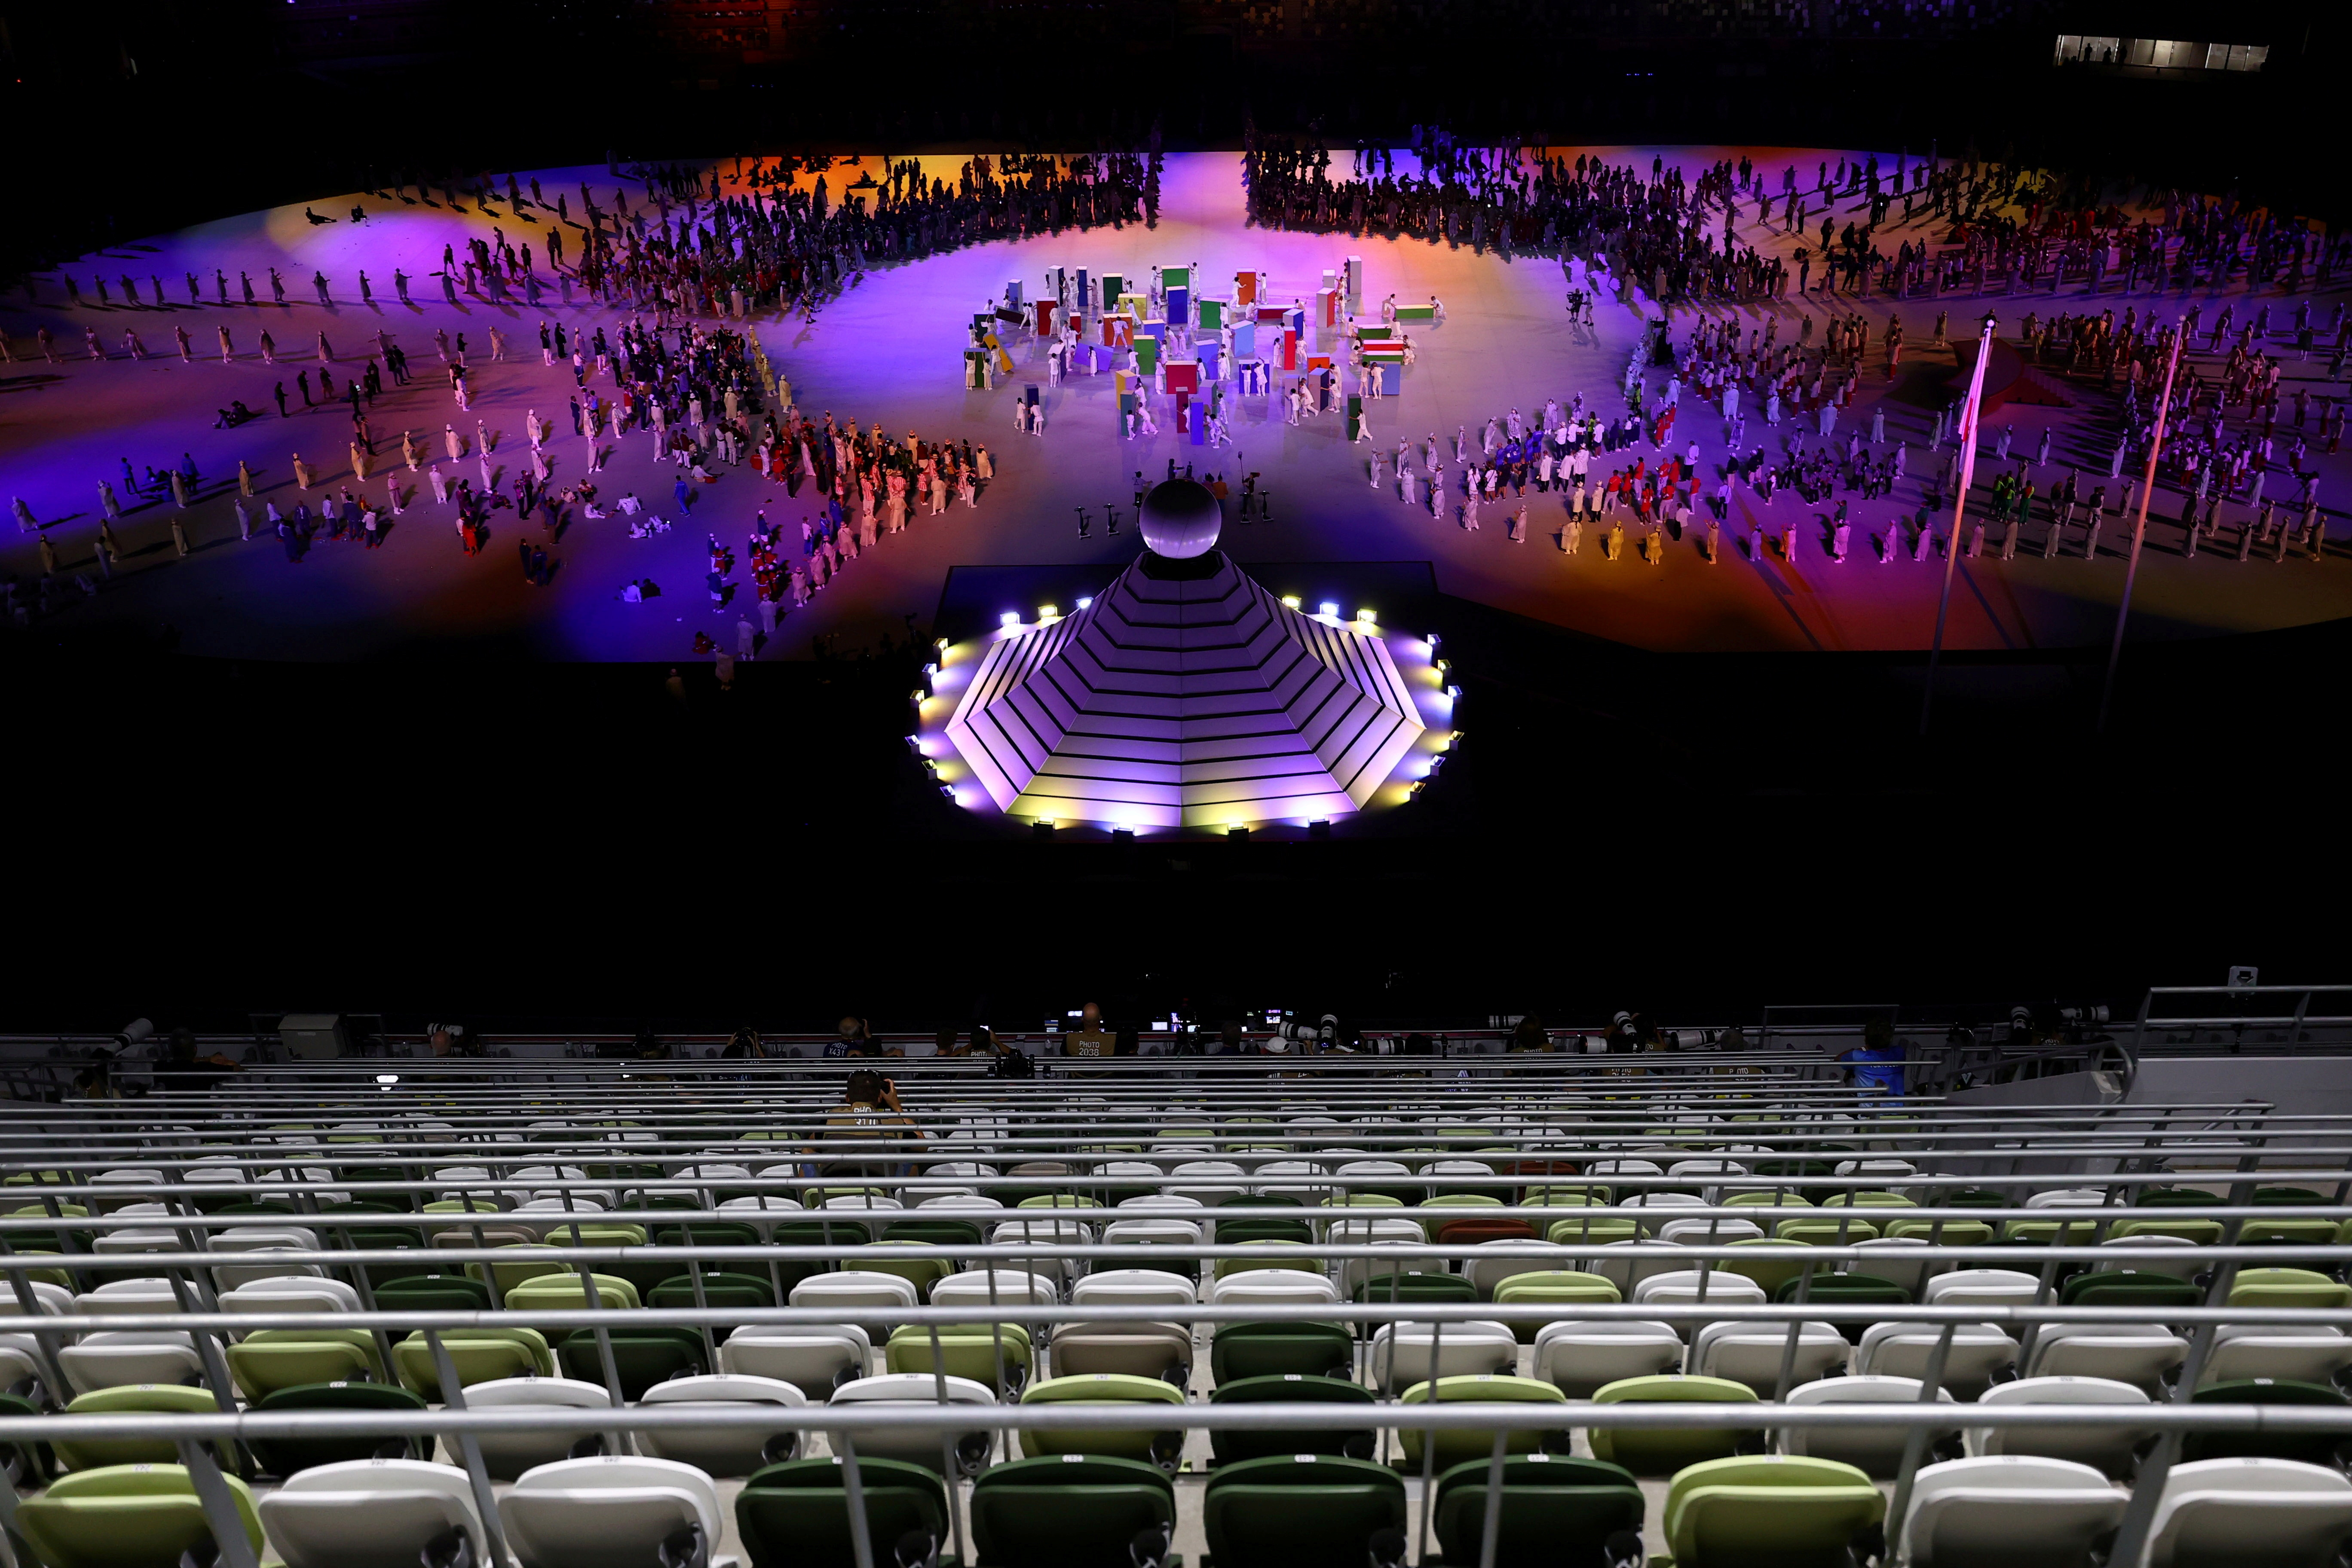 Tokyo 2020 Olympics - The Tokyo 2020 Olympics Opening Ceremony - Olympic Stadium, Tokyo, Japan - July 23, 2021. Empty seats in the stadium during the opening ceremony REUTERS/Leonhard Foeger/File Photo